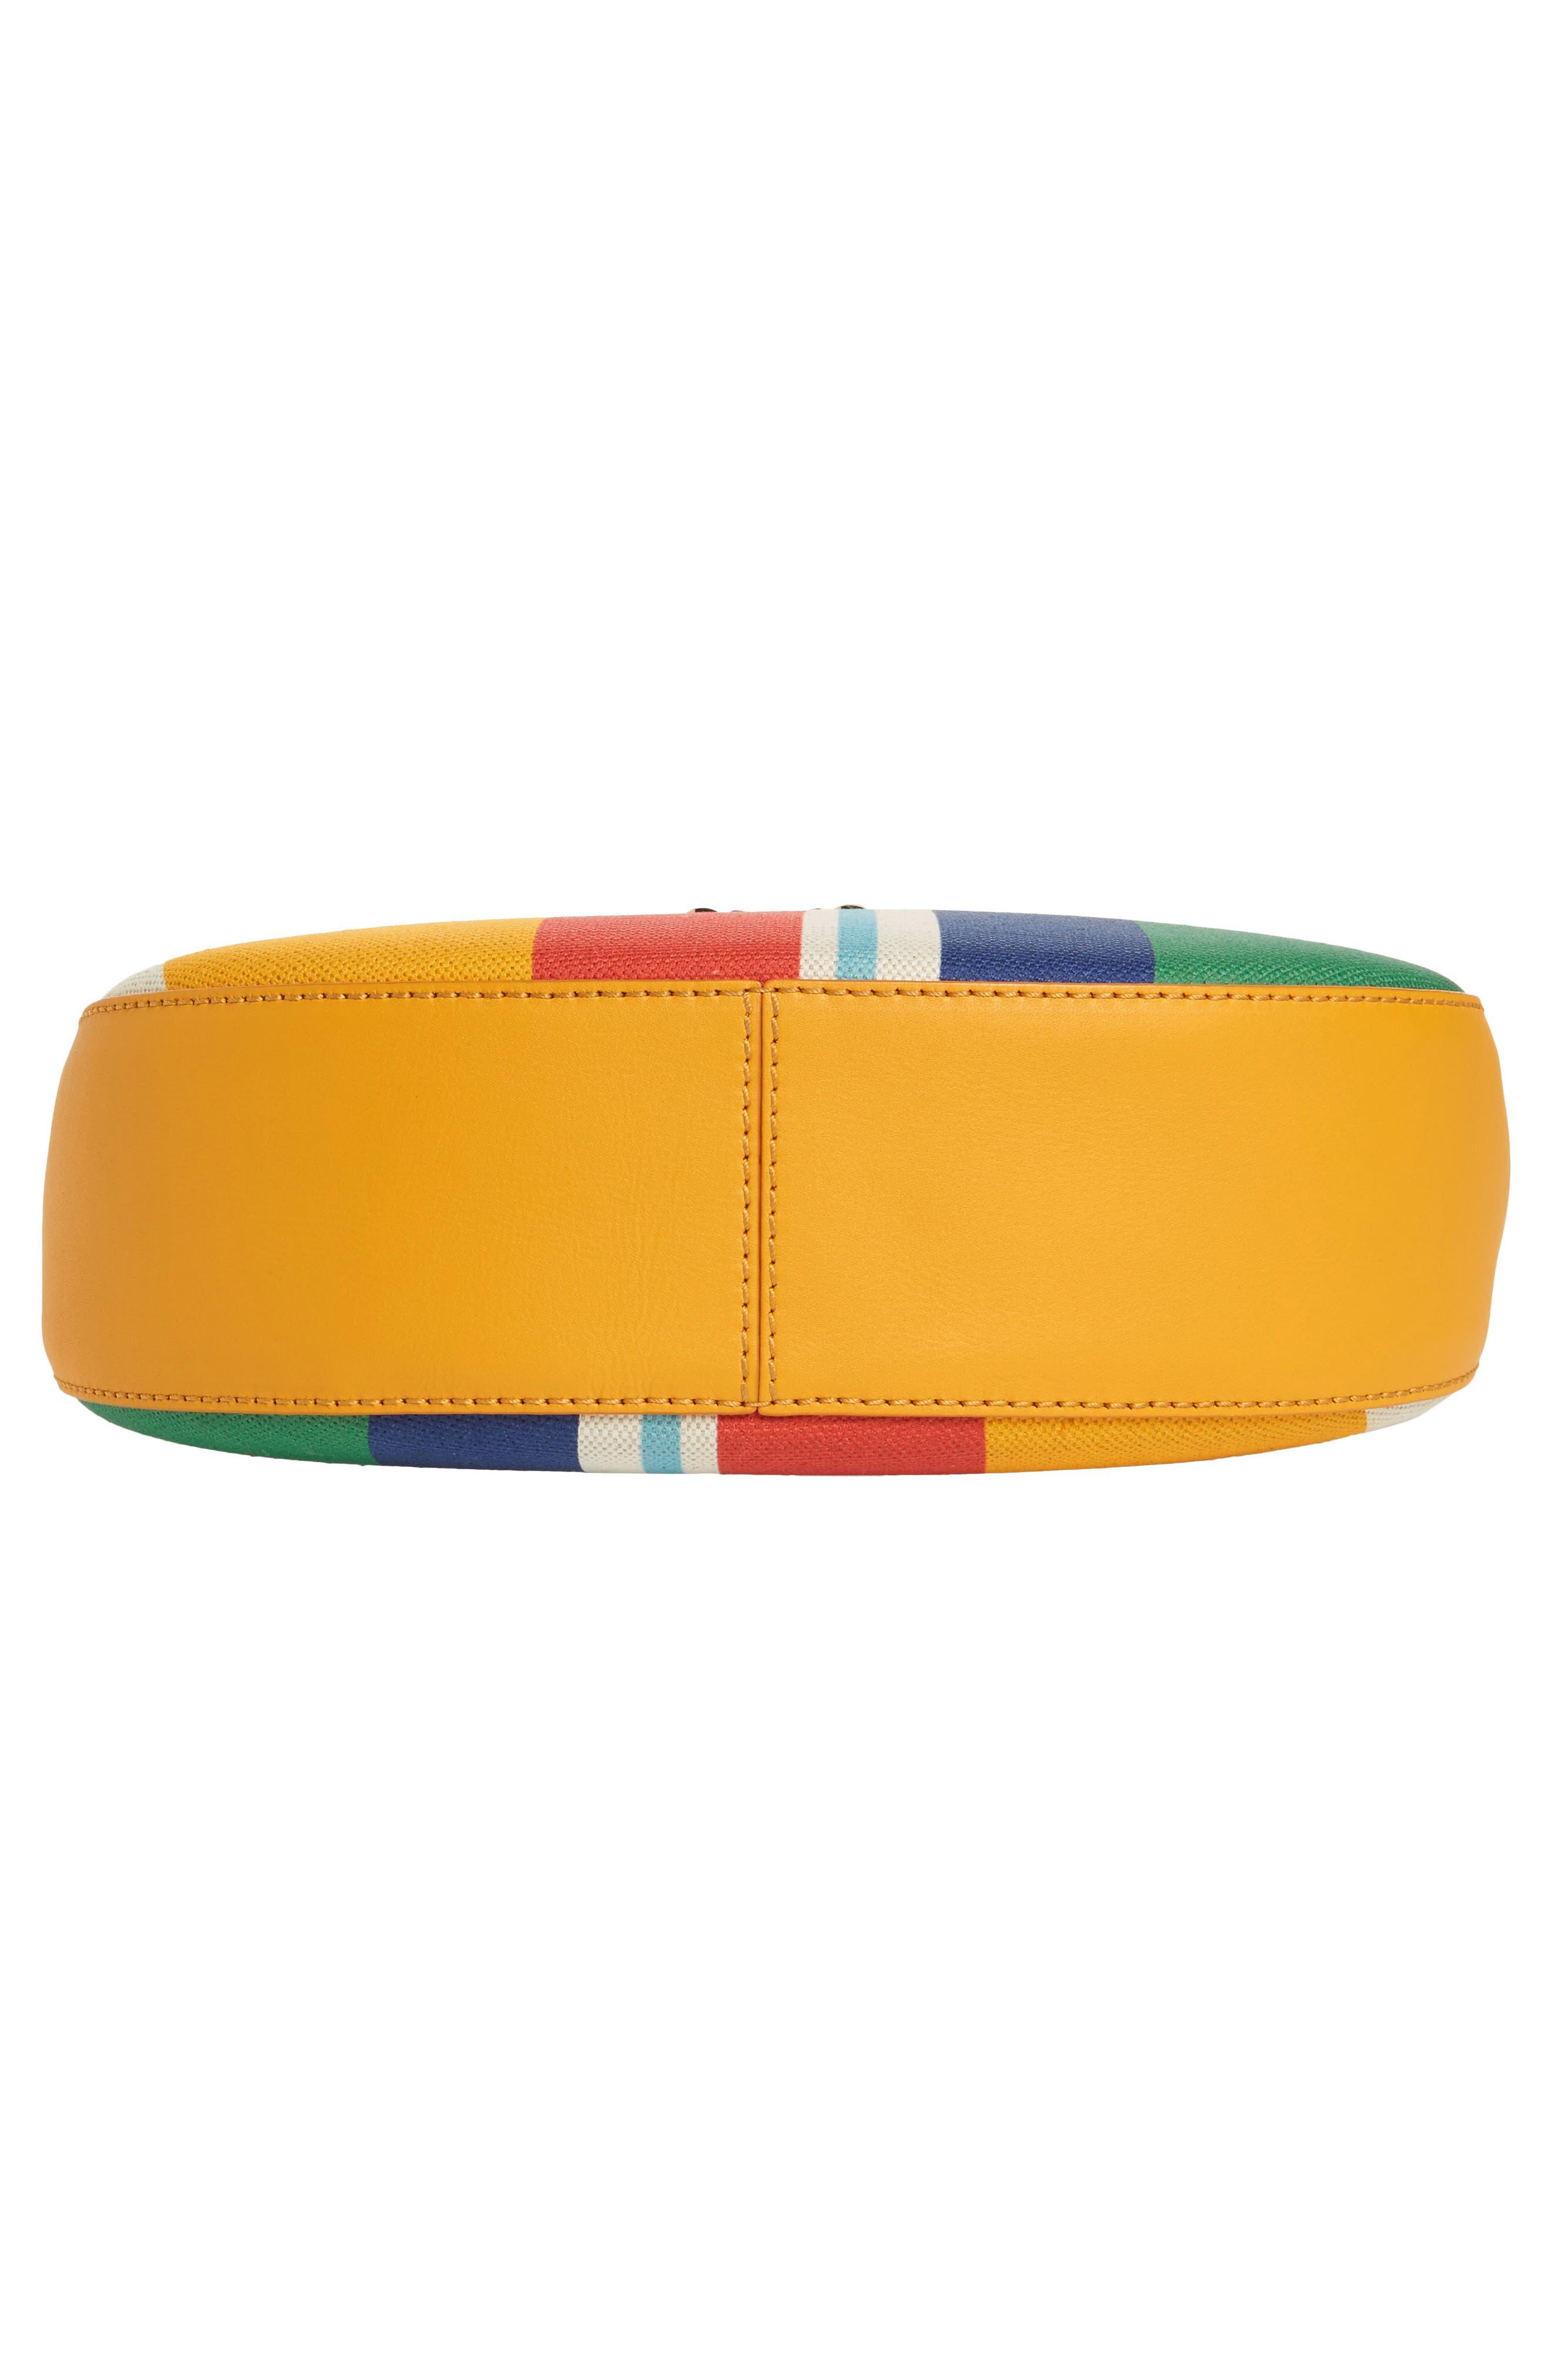 Medium Patricia Canvas Hobo Bag,                             Alternate thumbnail 6, color,                             Rainbow Yellow